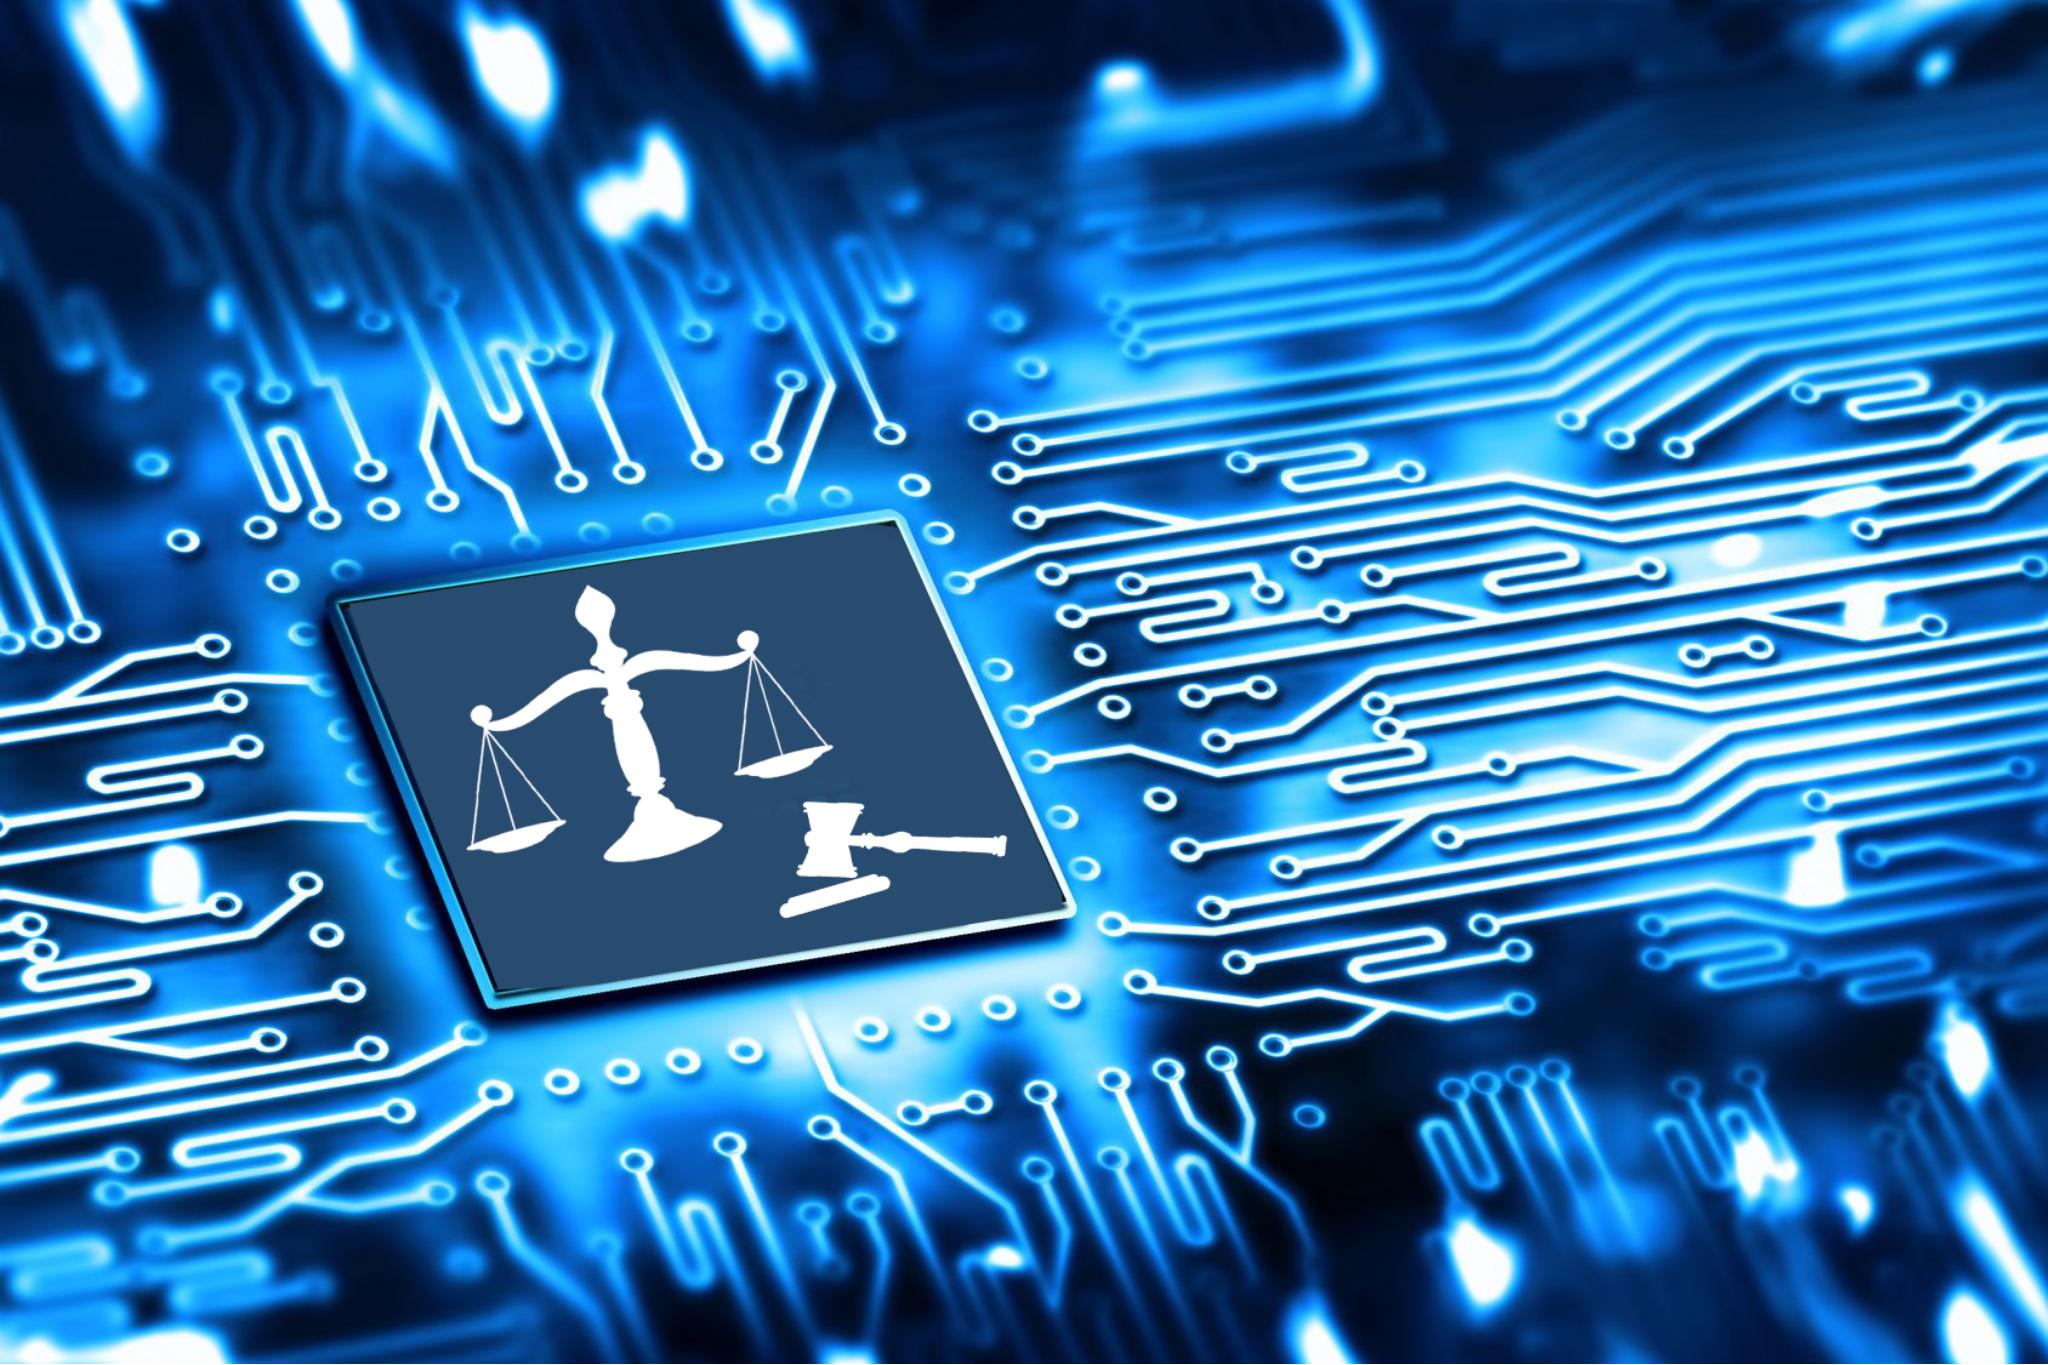 Драйверы развития рынка LegalTech